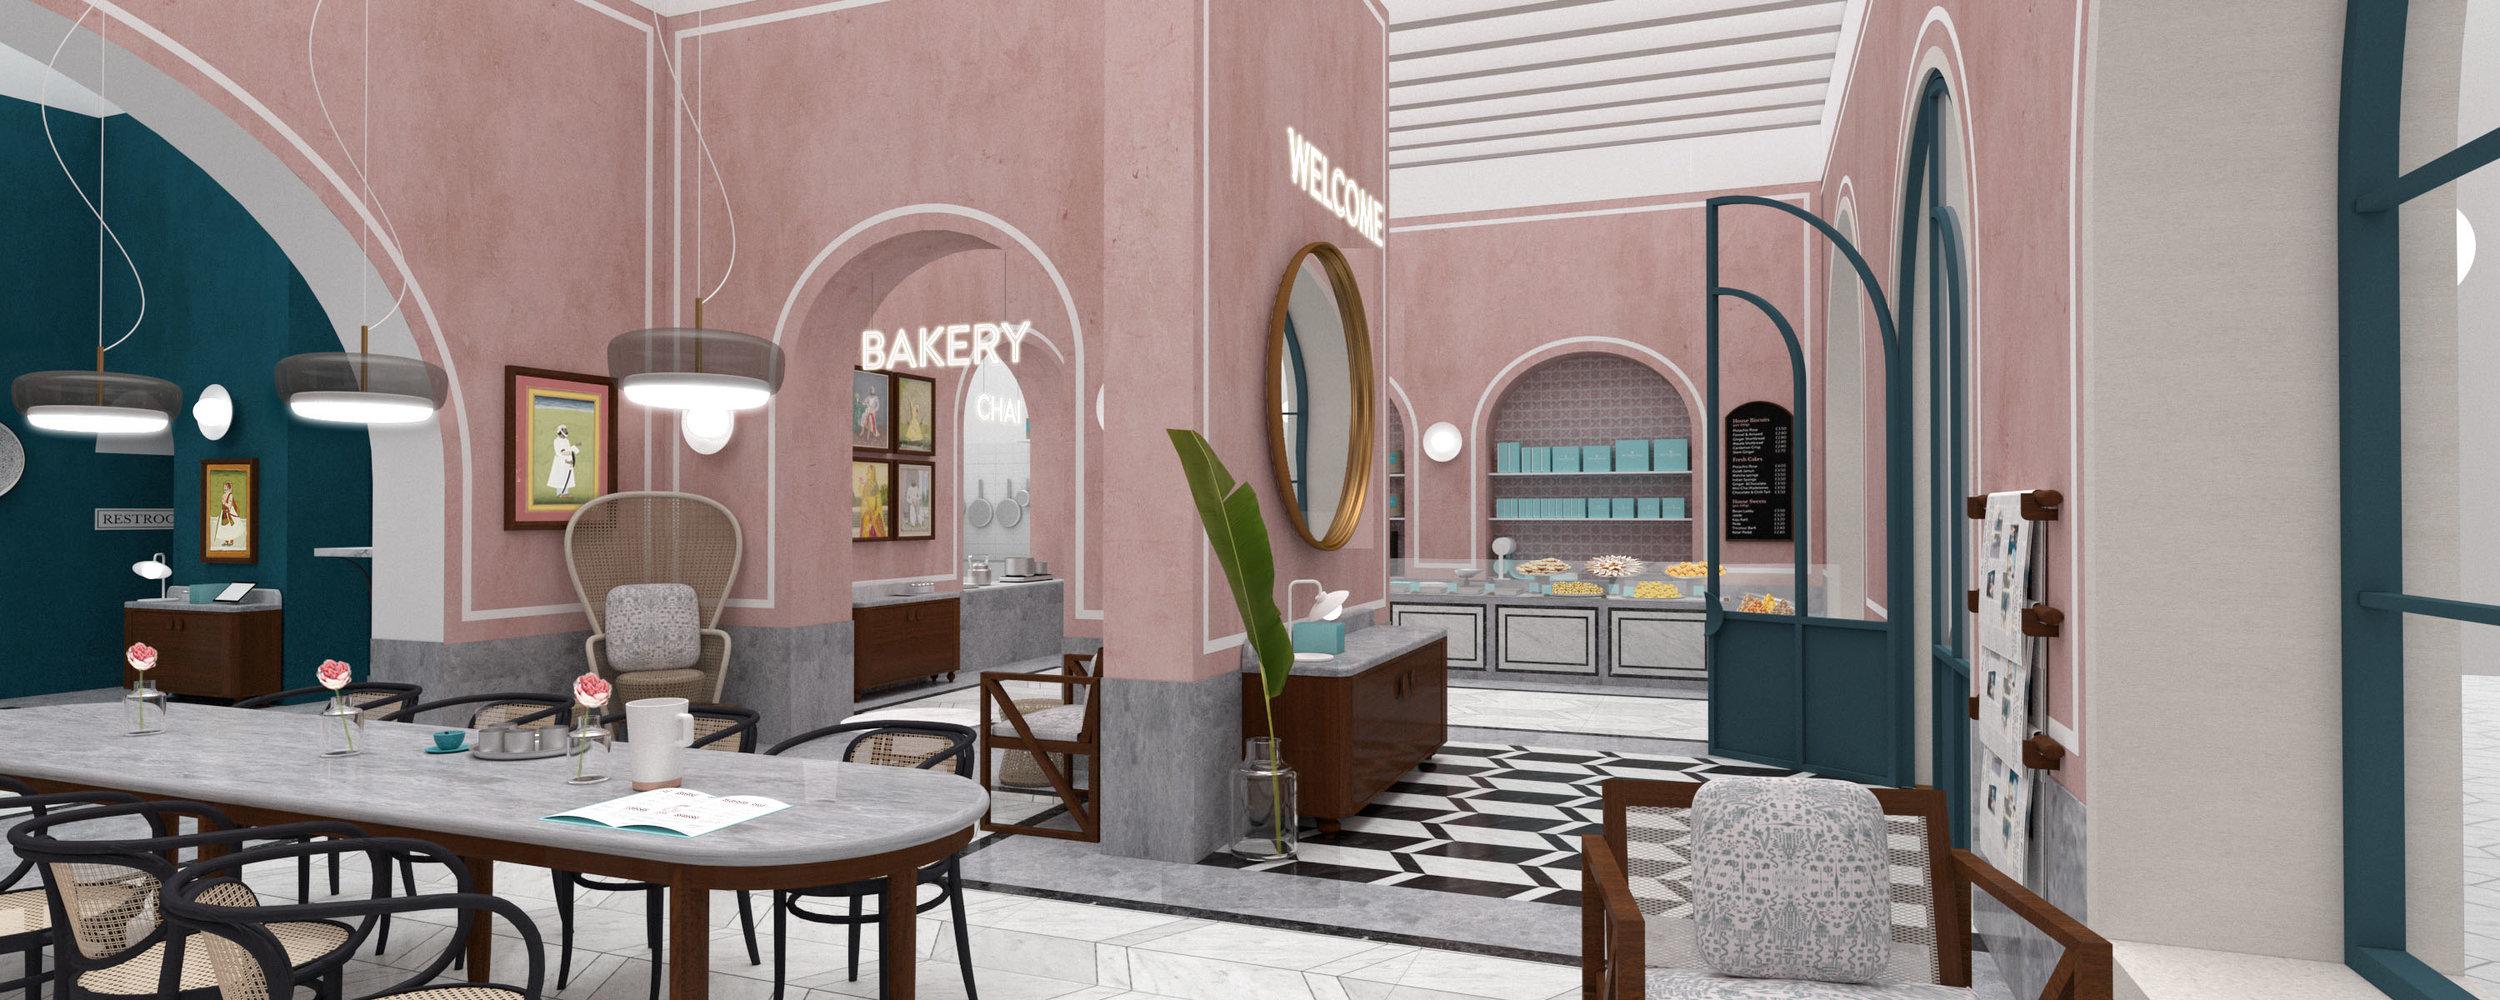 lunarlunar_interior_design_cafe_bakery_restaurant_pistachio_rose_seating_2.jpg